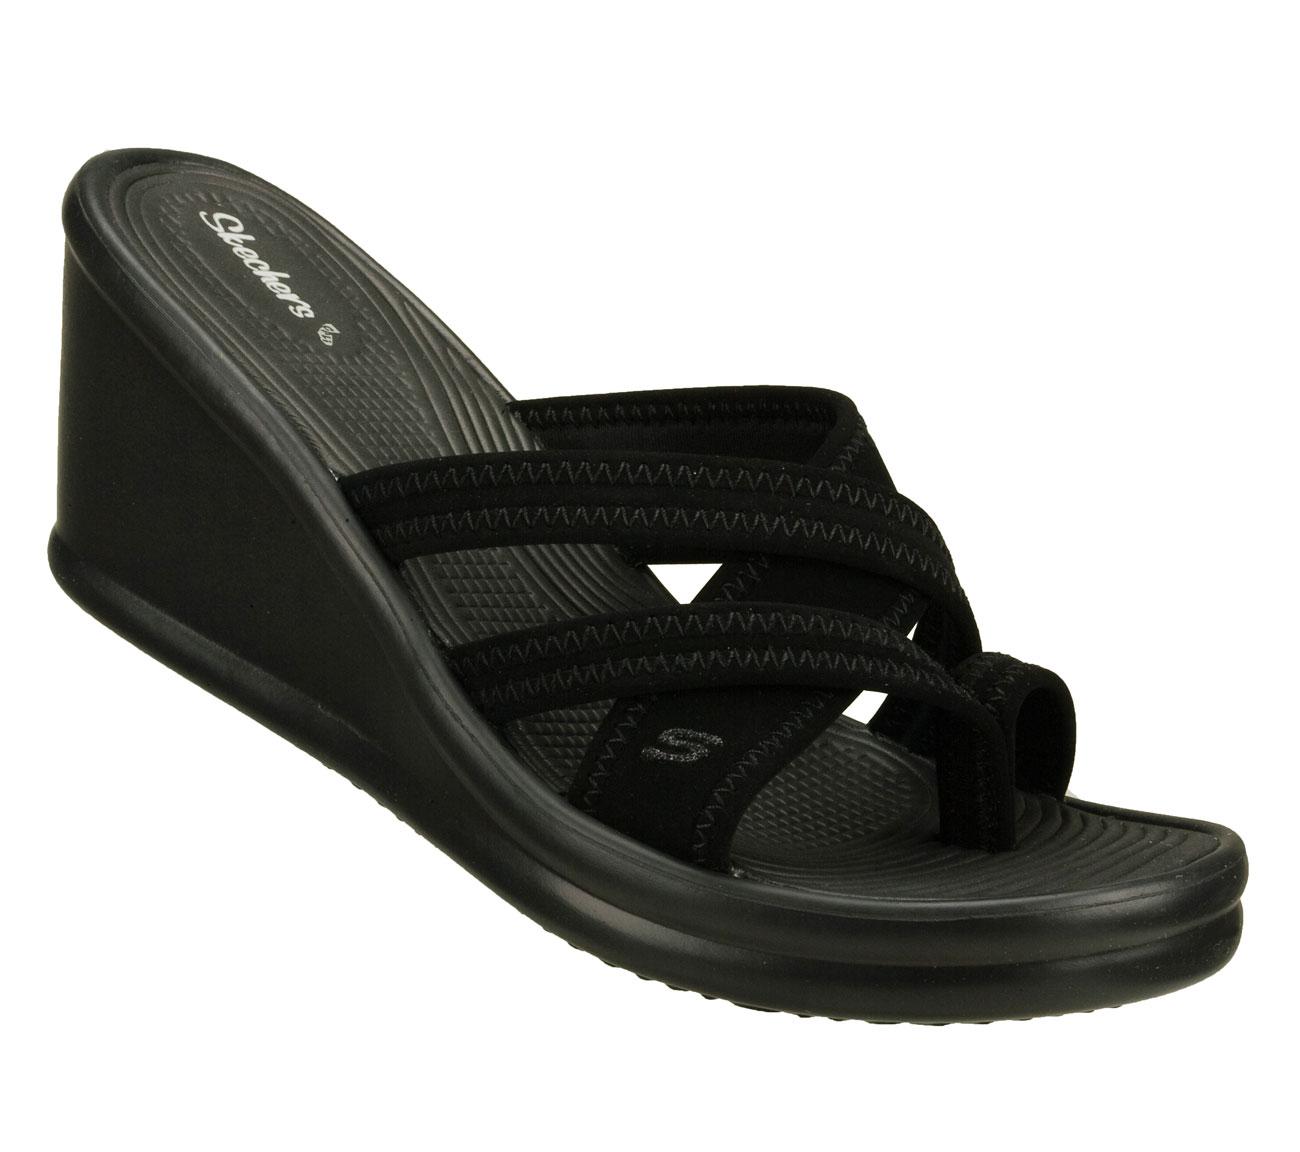 Amazing Buy SKECHERS Parallel  Sparkle Eyes Comfort Sandals Shoes